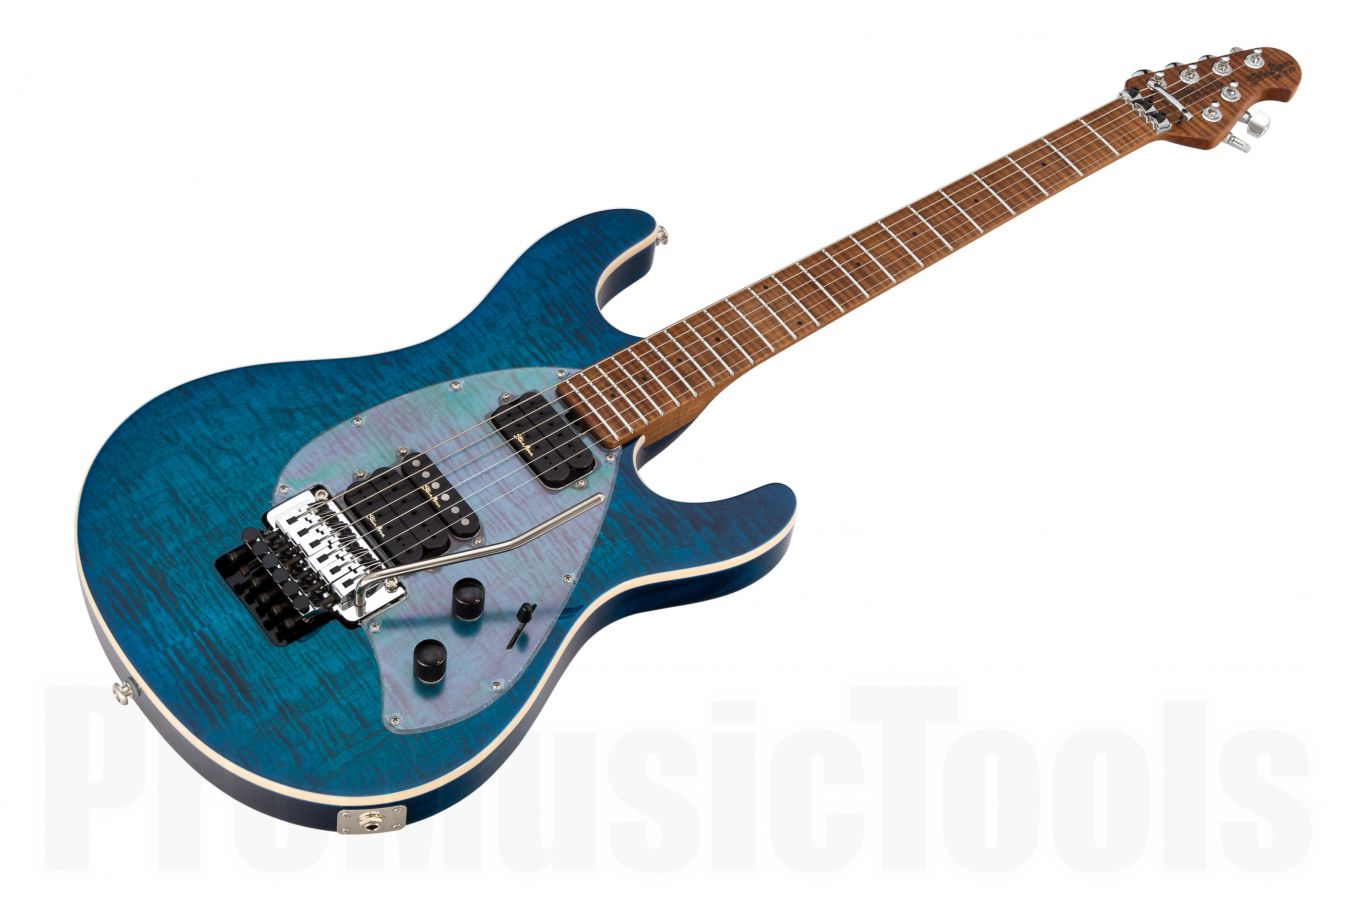 Music Man USA Steve Morse Y2D FR NB - PDN Neptune Blue Roasted Neck Limited Edition QT MN PV